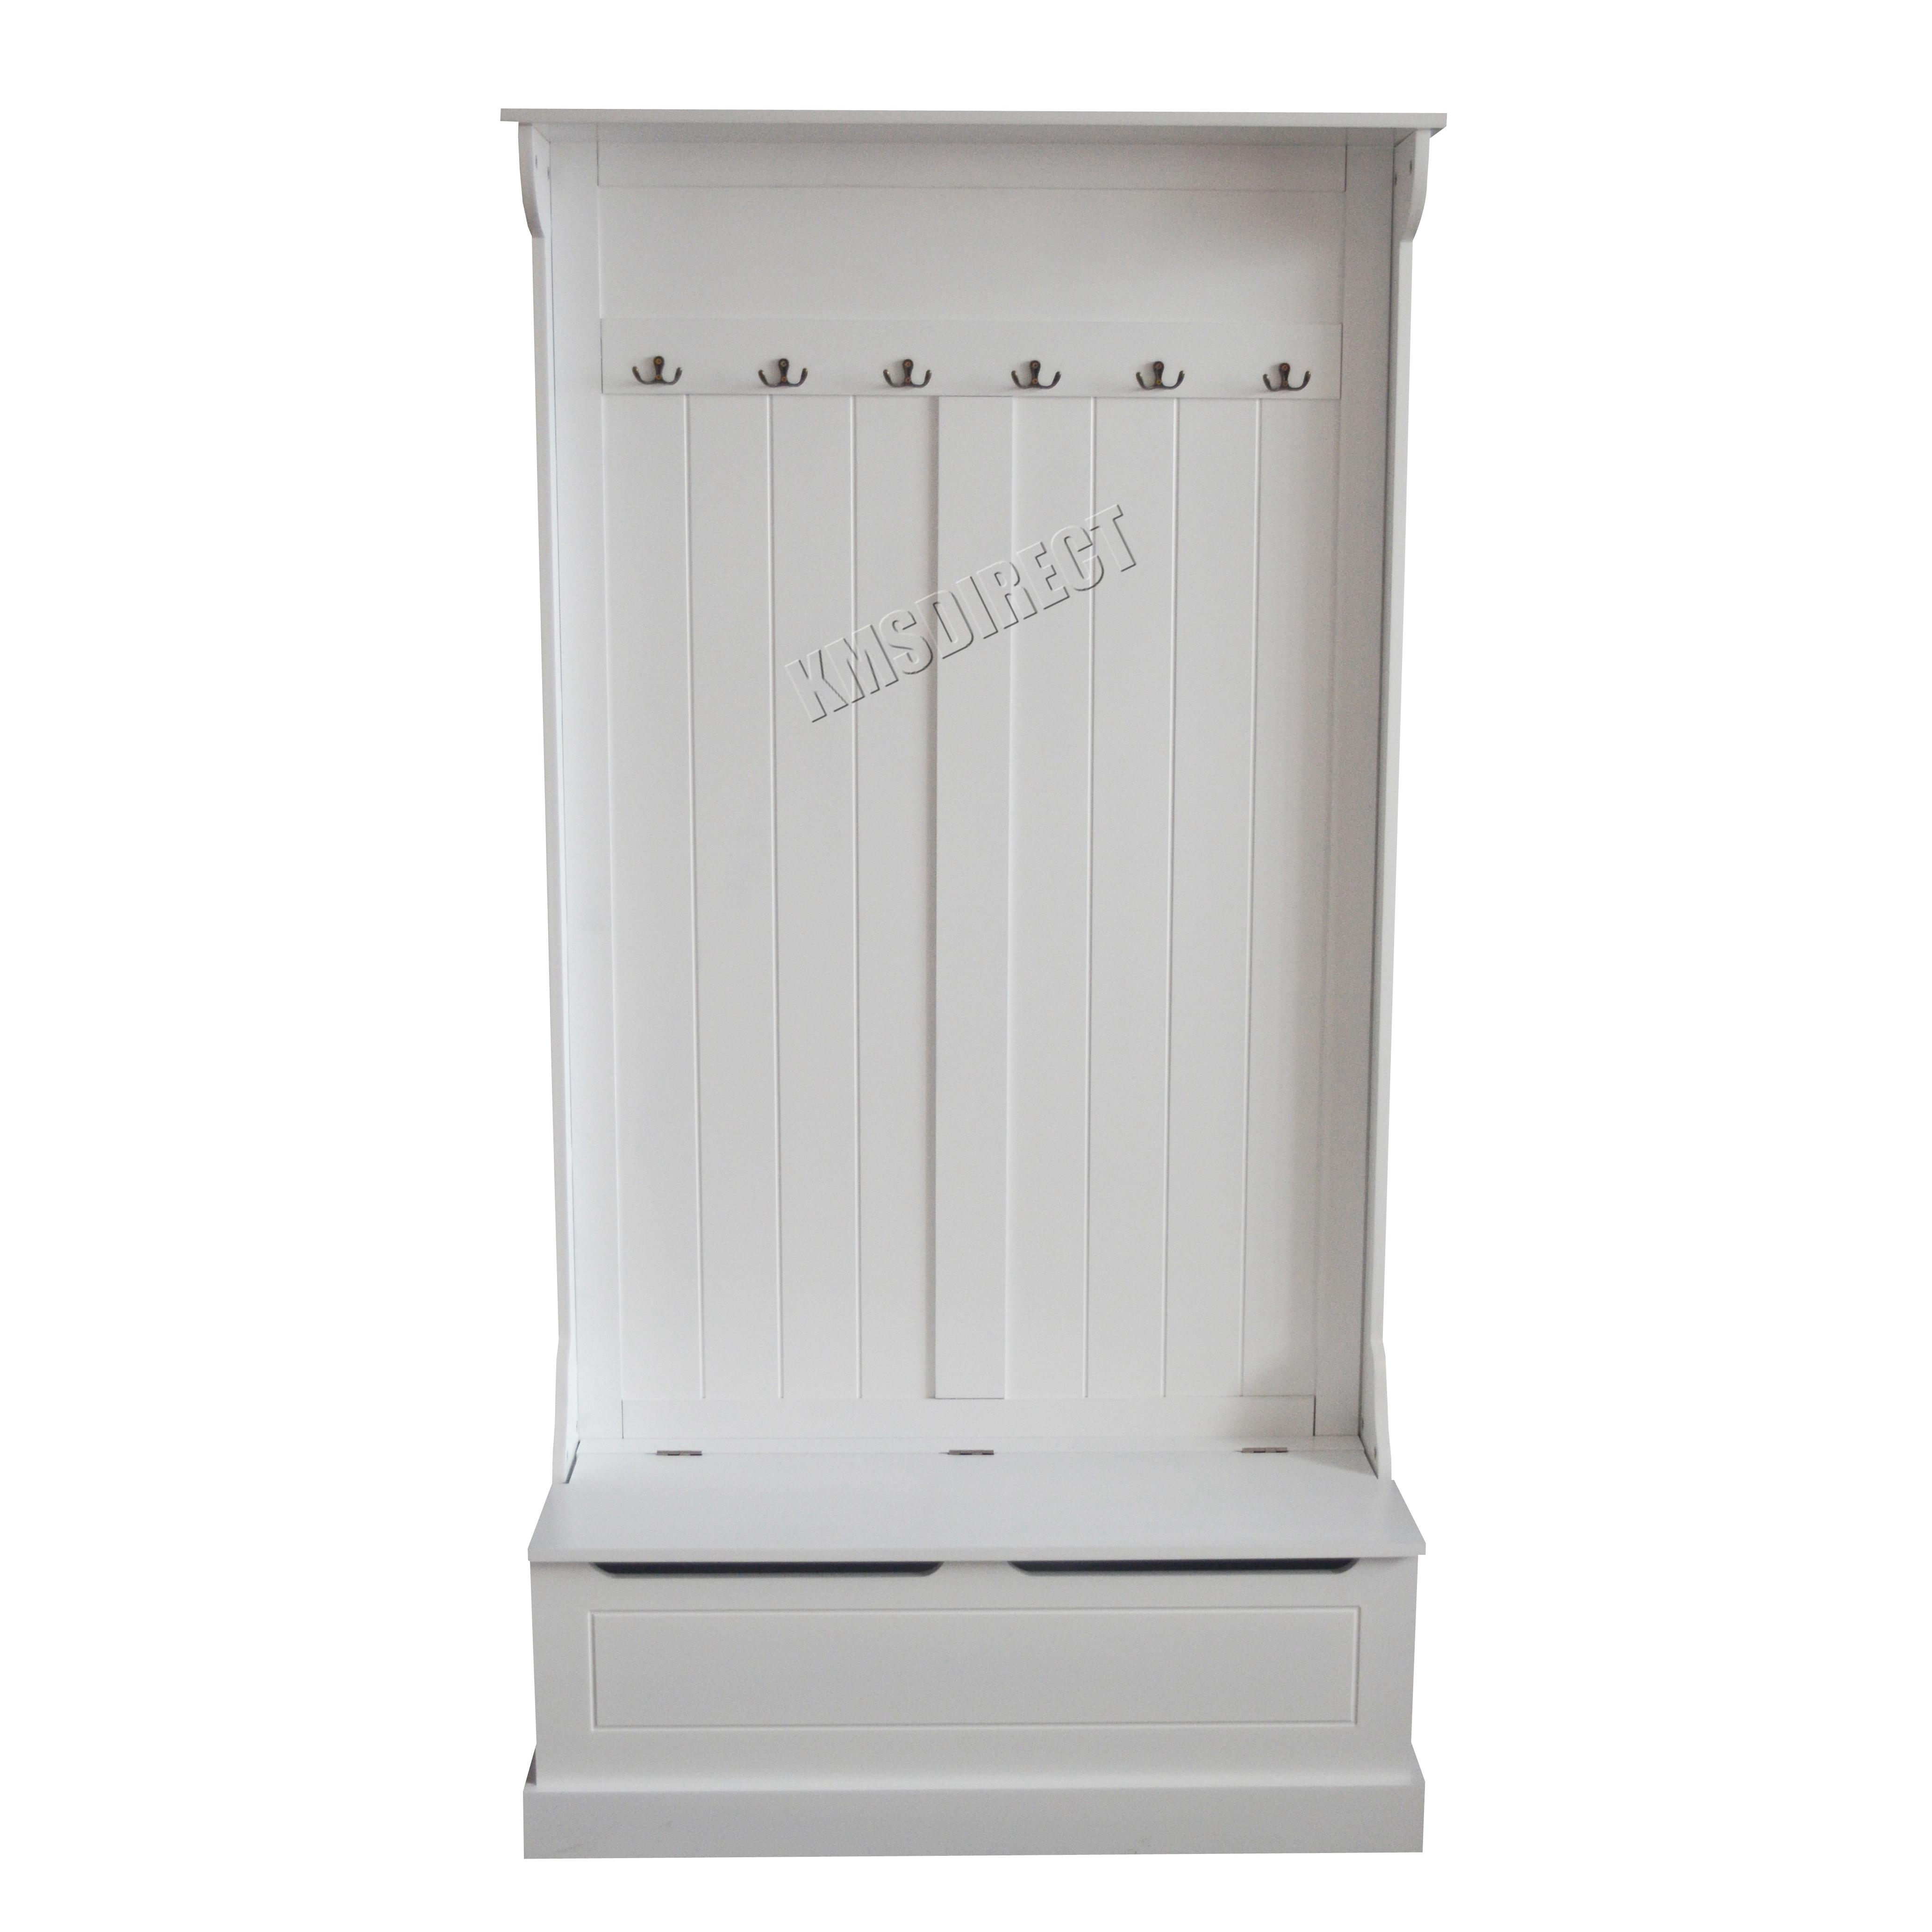 Foxhunter Wooden Shoe Storage Cabinet Bench Coat Hook